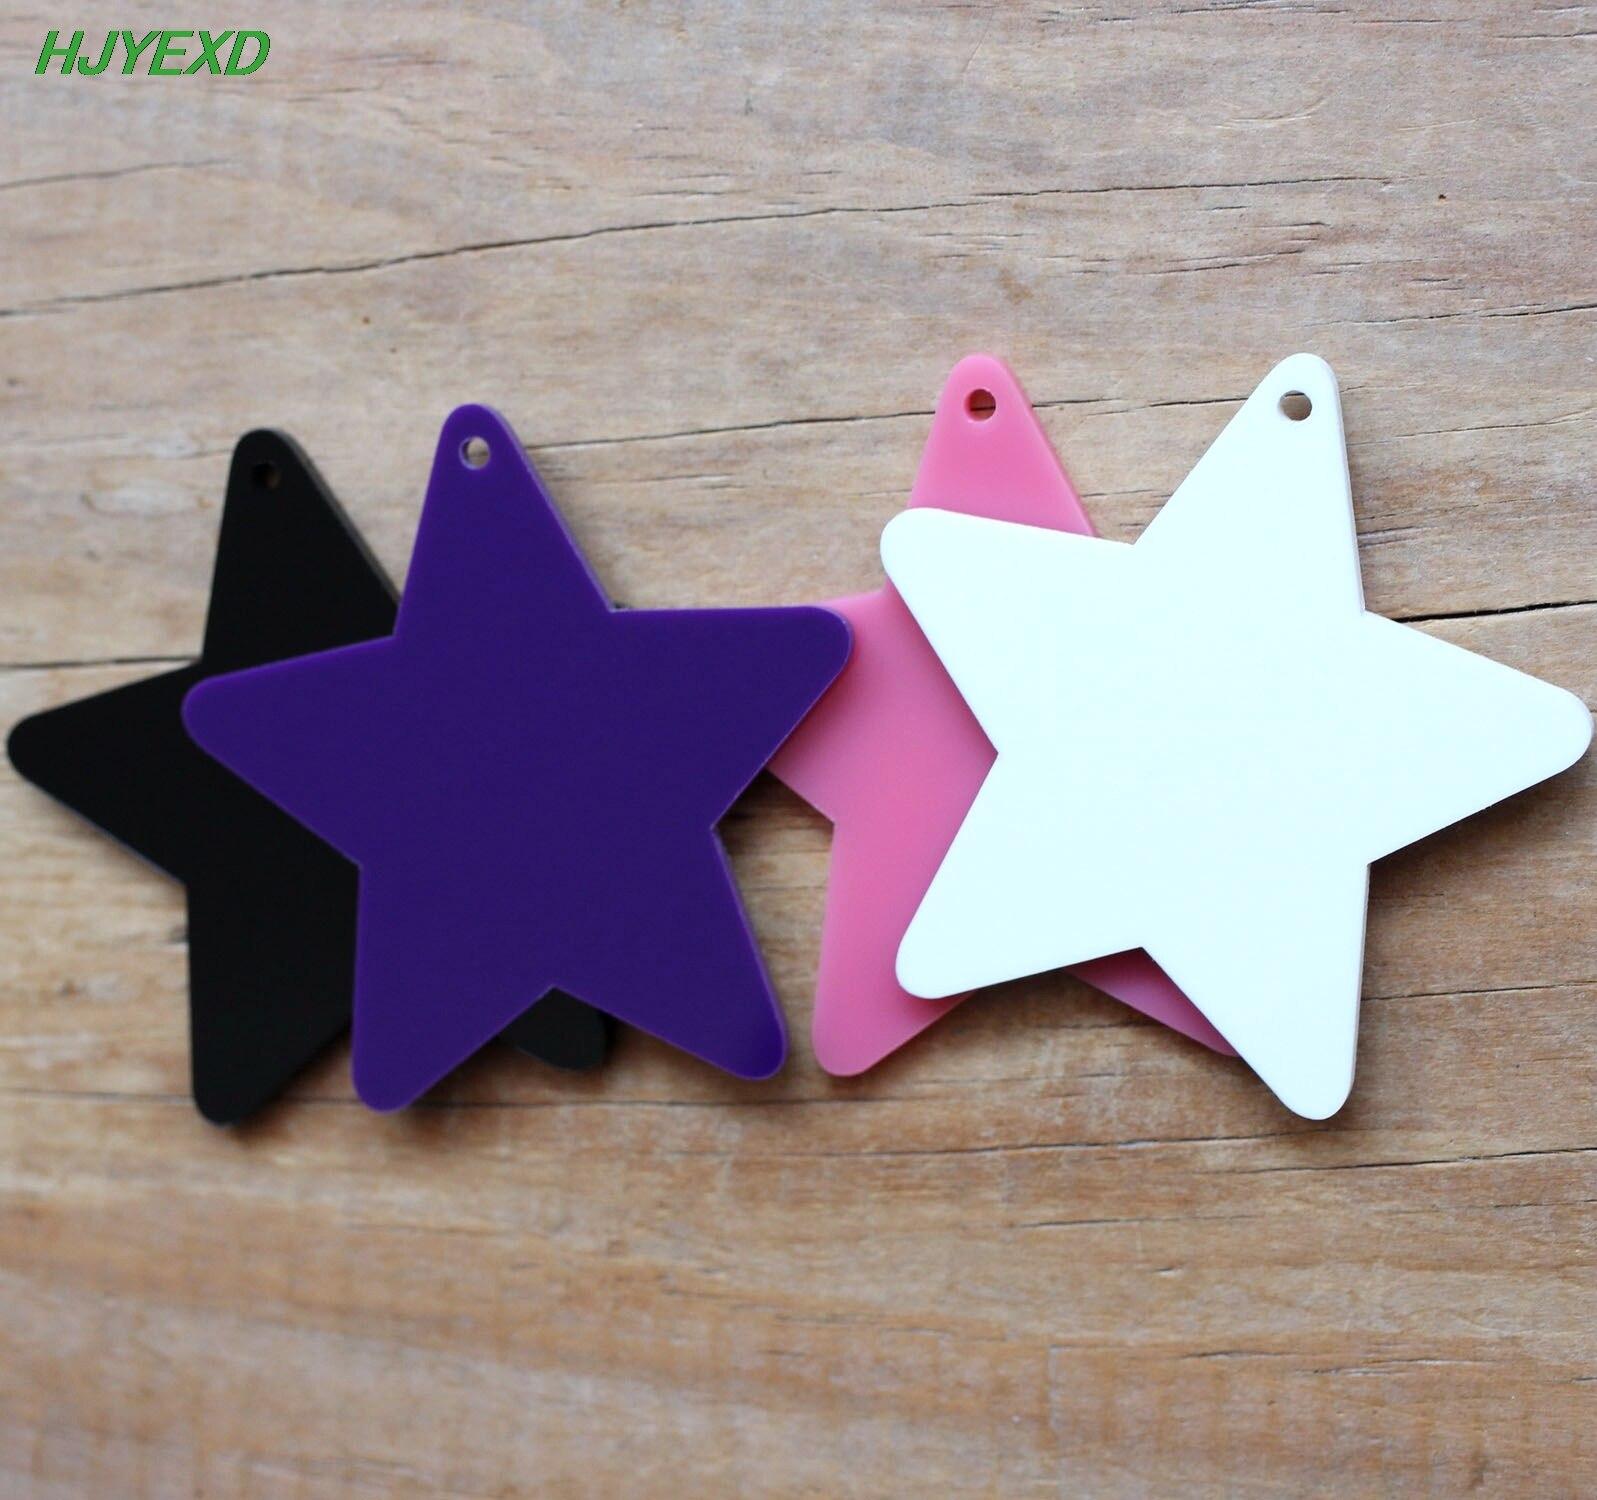 50mm Acrylic Star Keychains Black, White, Pink, Dark Purple Laser Cut Party Ornaments 2